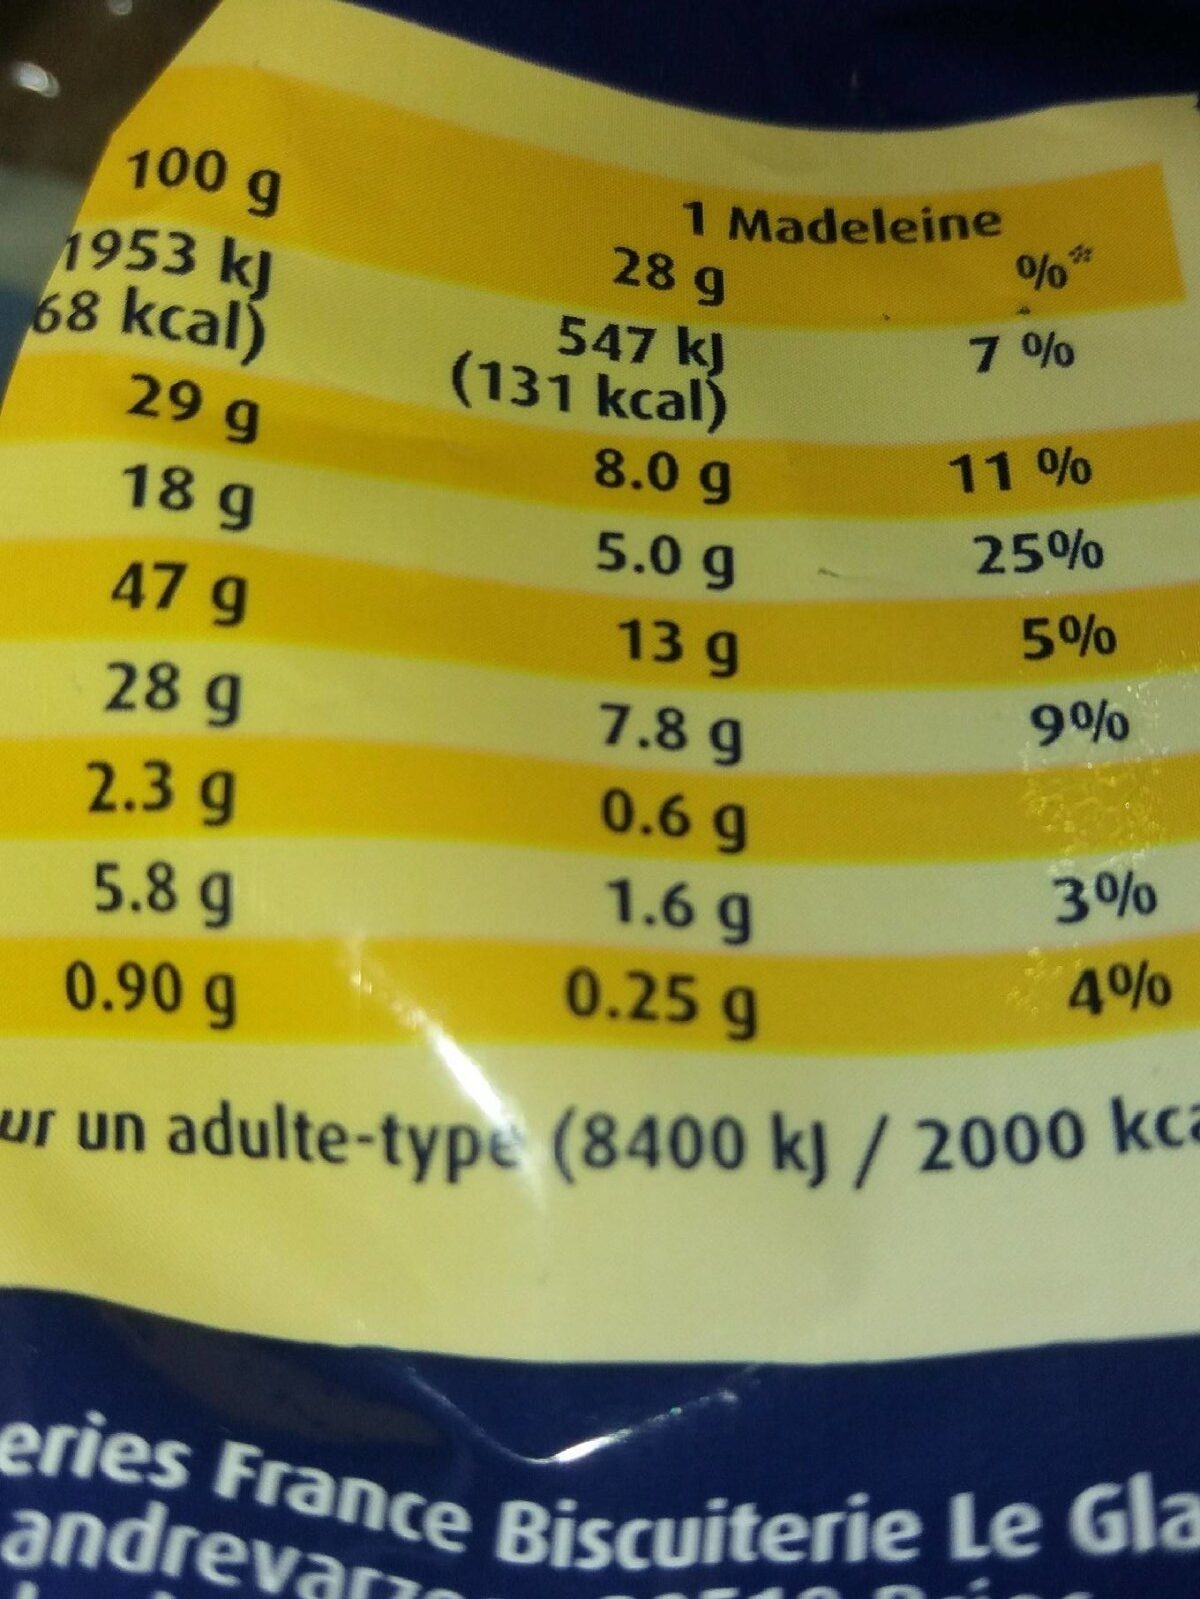 Madeleine marbrées Le Glazik - Nutrition facts